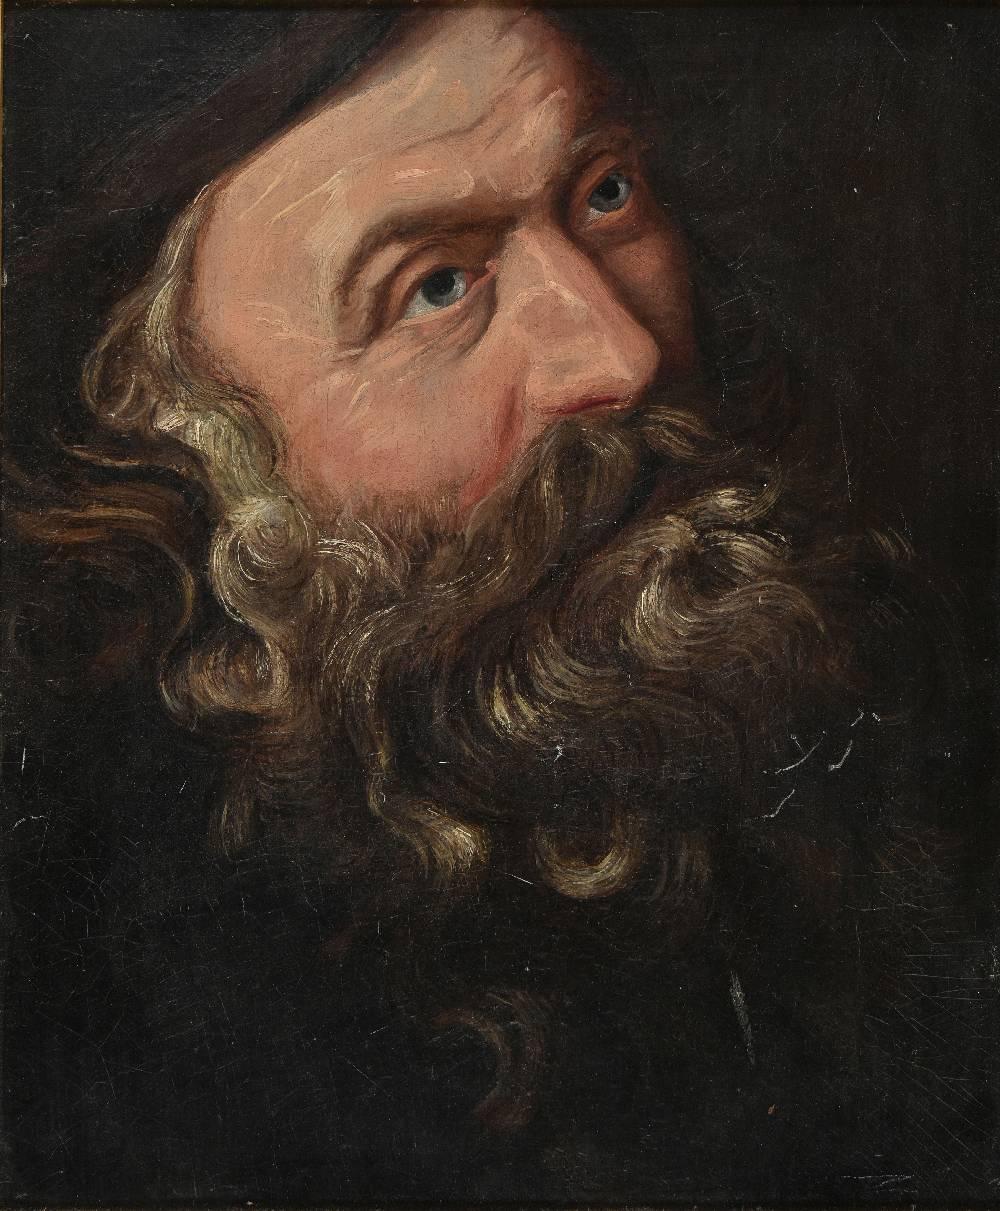 Lot 12 - *After William Dobson (1611-1646). Inigo Jones the celebrated architect, 1641, 19th century oil on